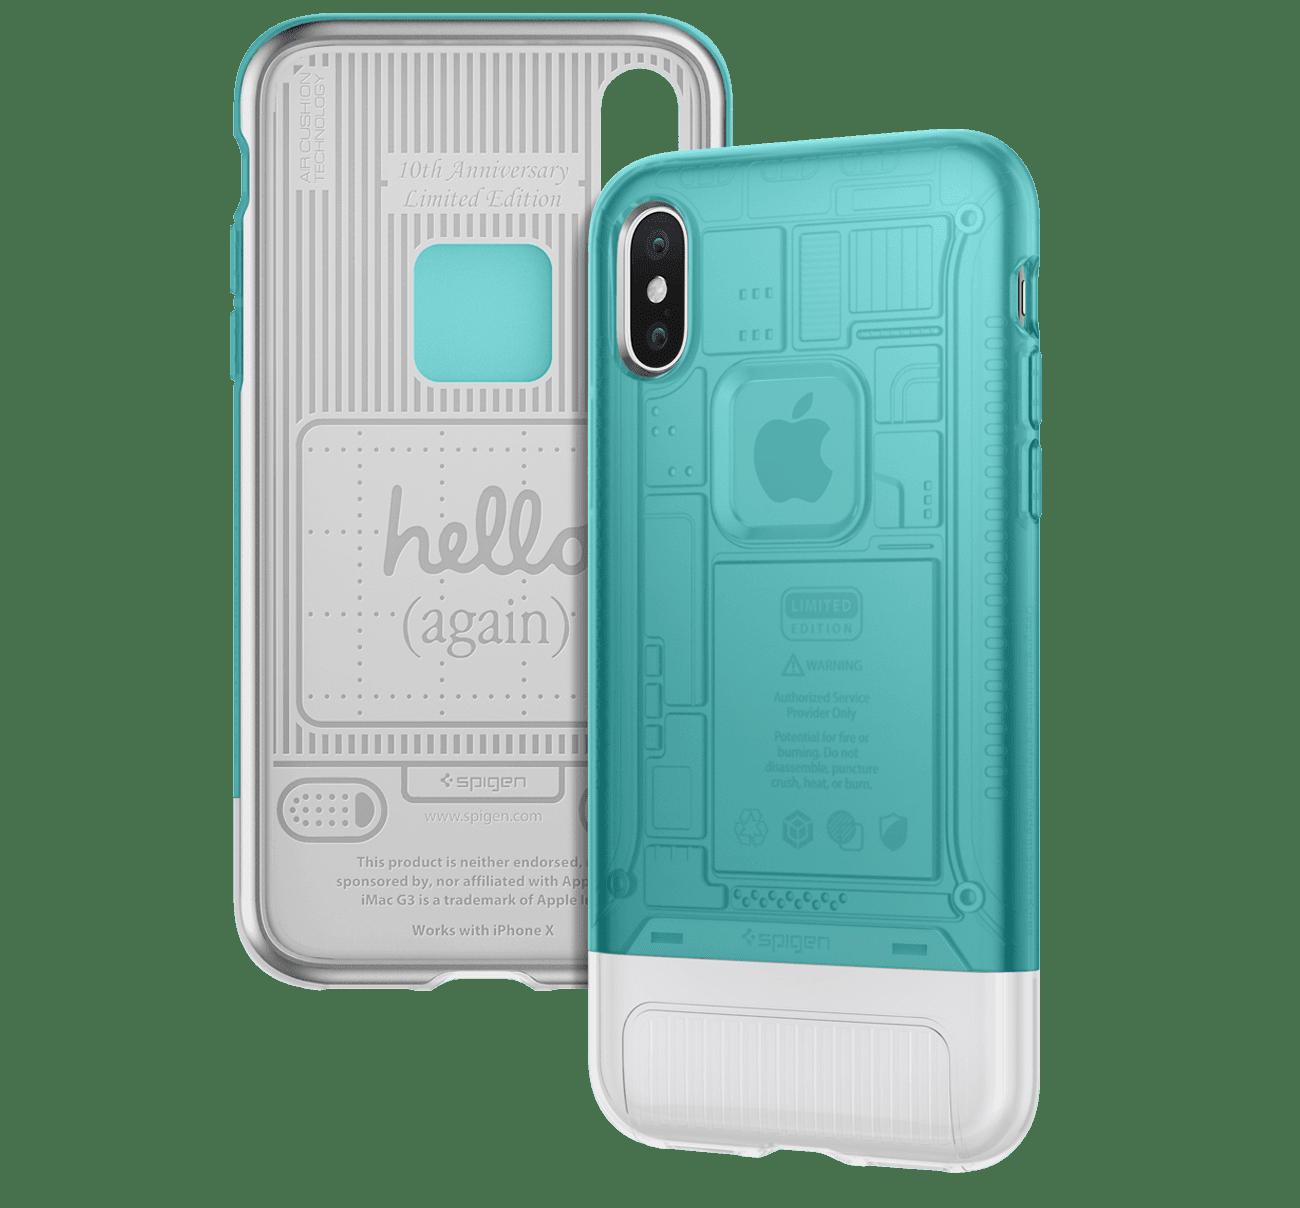 spigen retro imac case iphone x - Spigen predstavil sériu retro obalov pre iPhone X